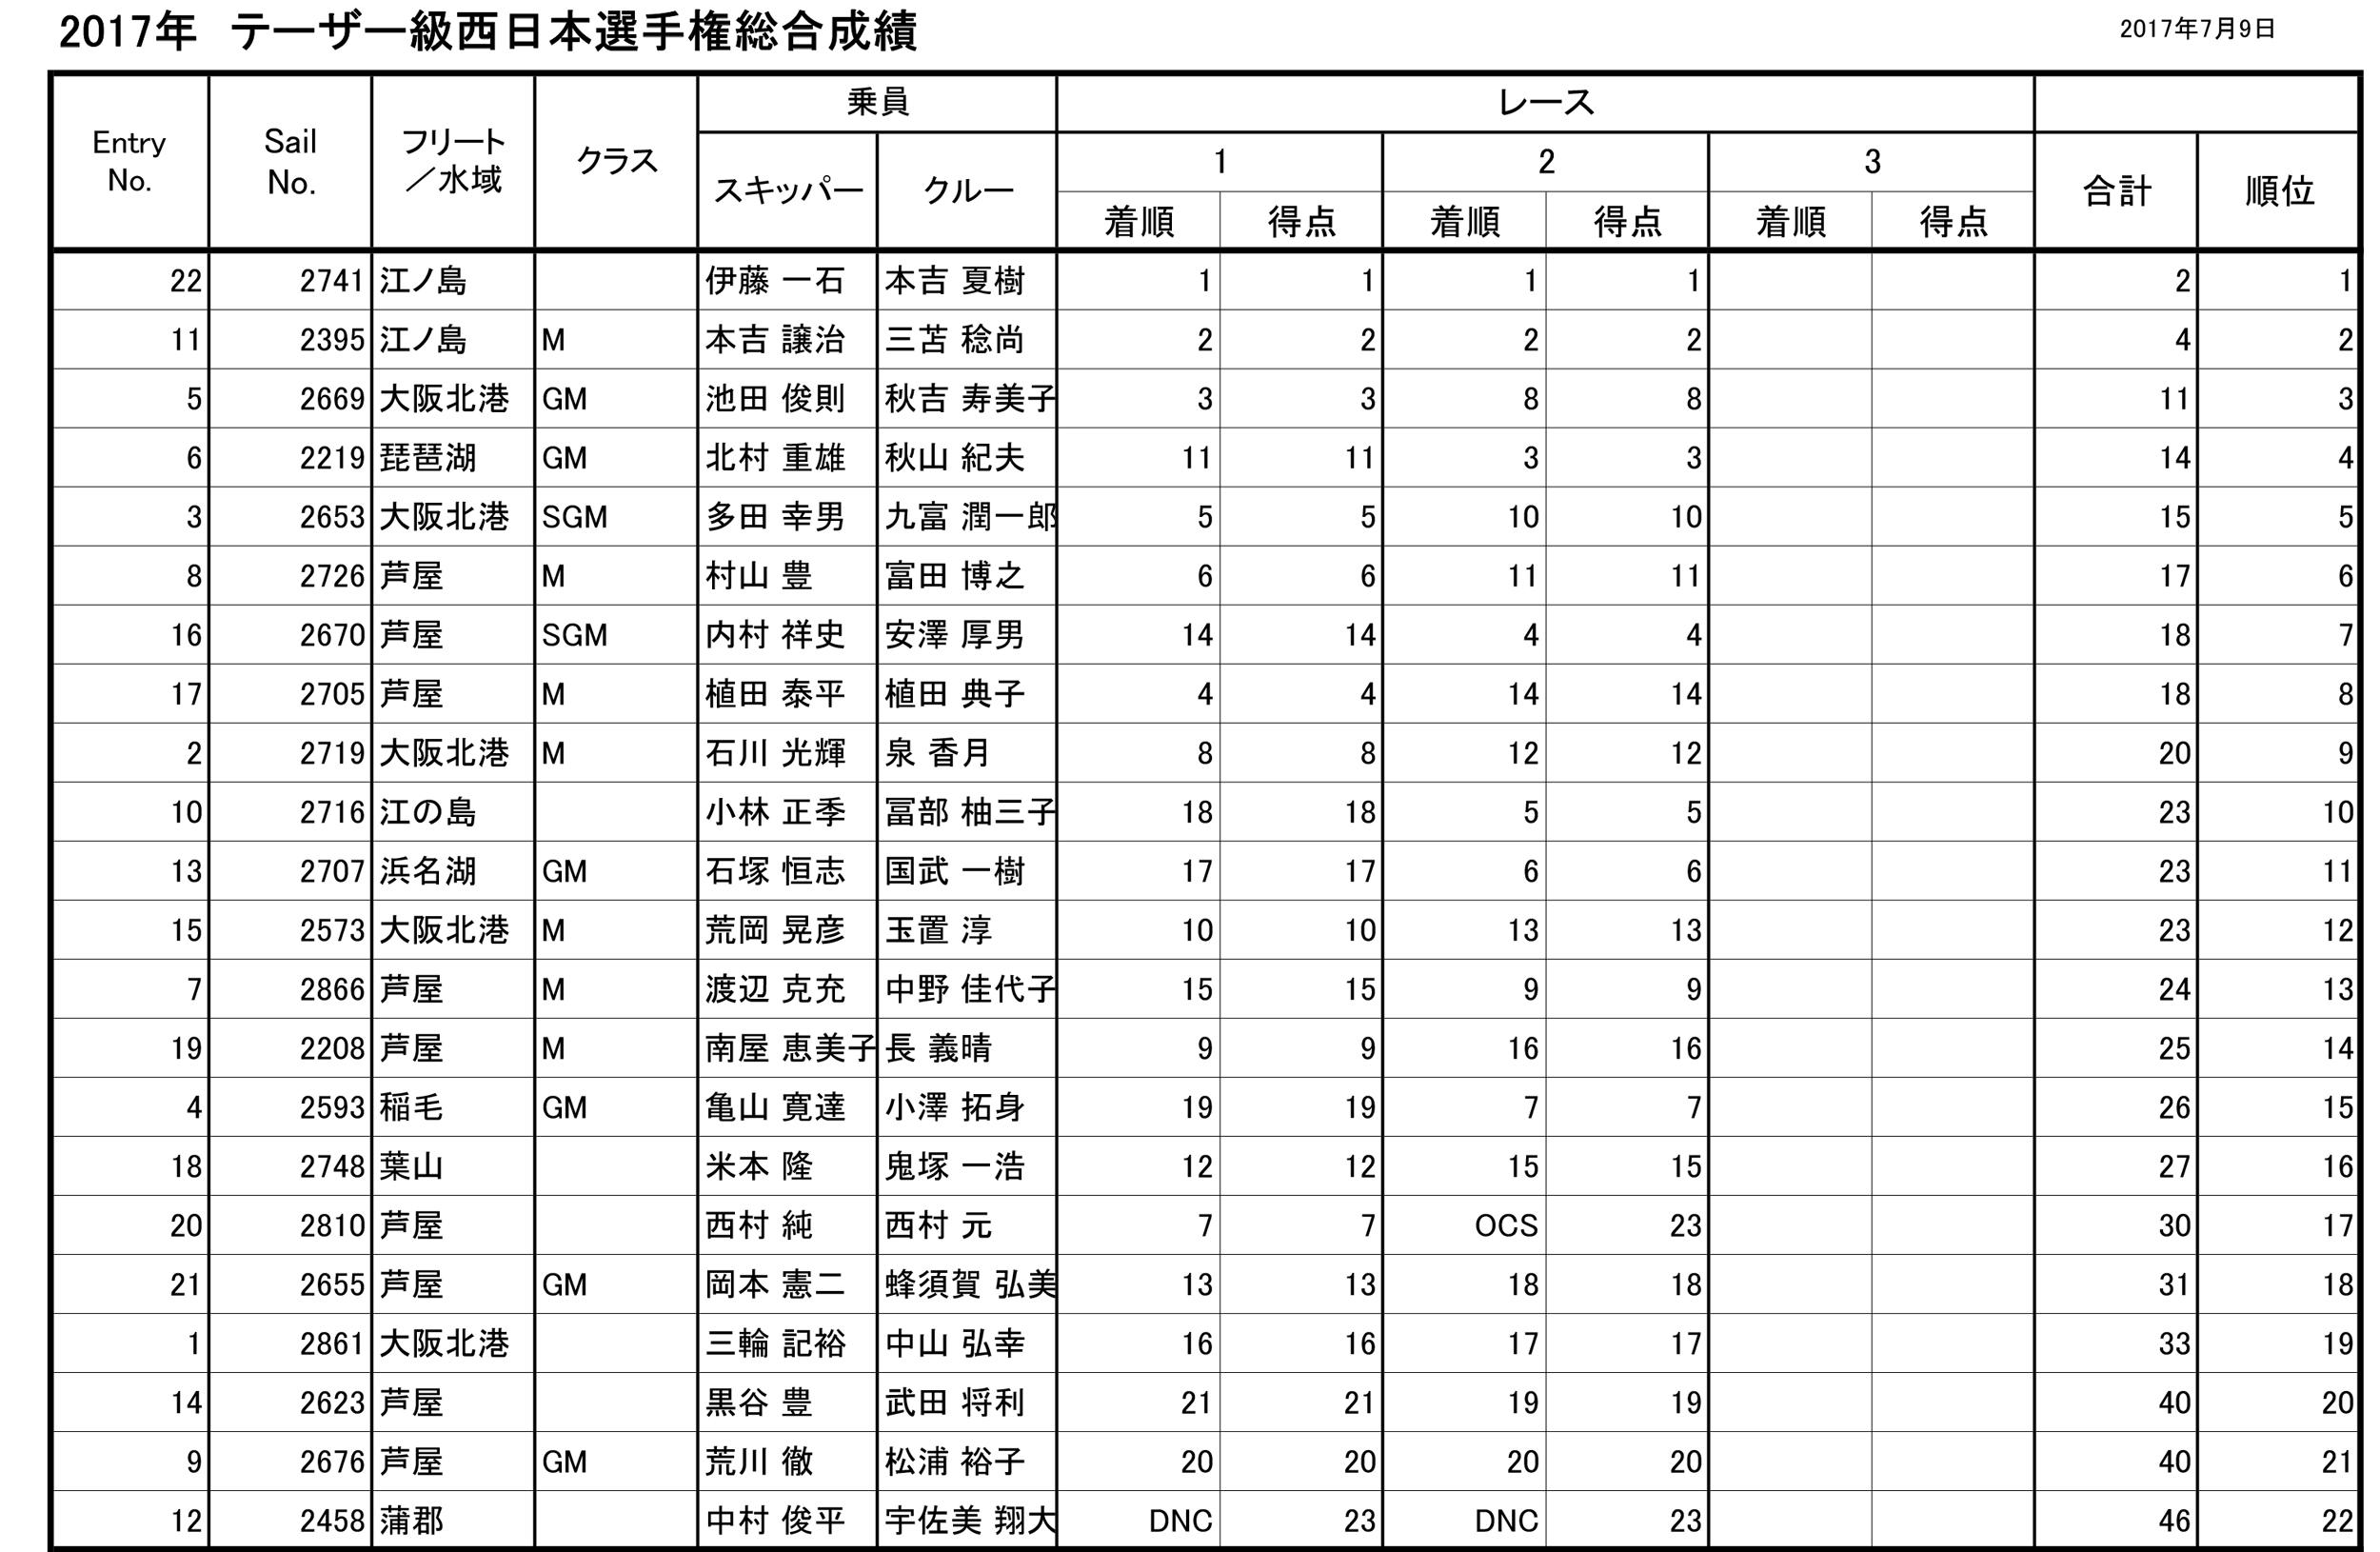 2017-07-12_result